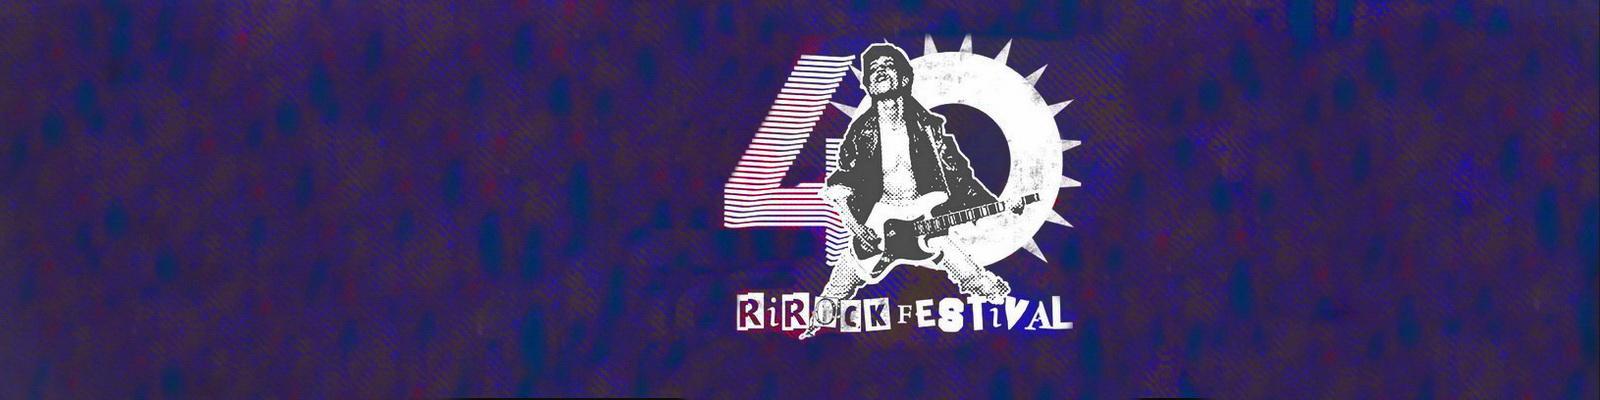 Ri rock 40